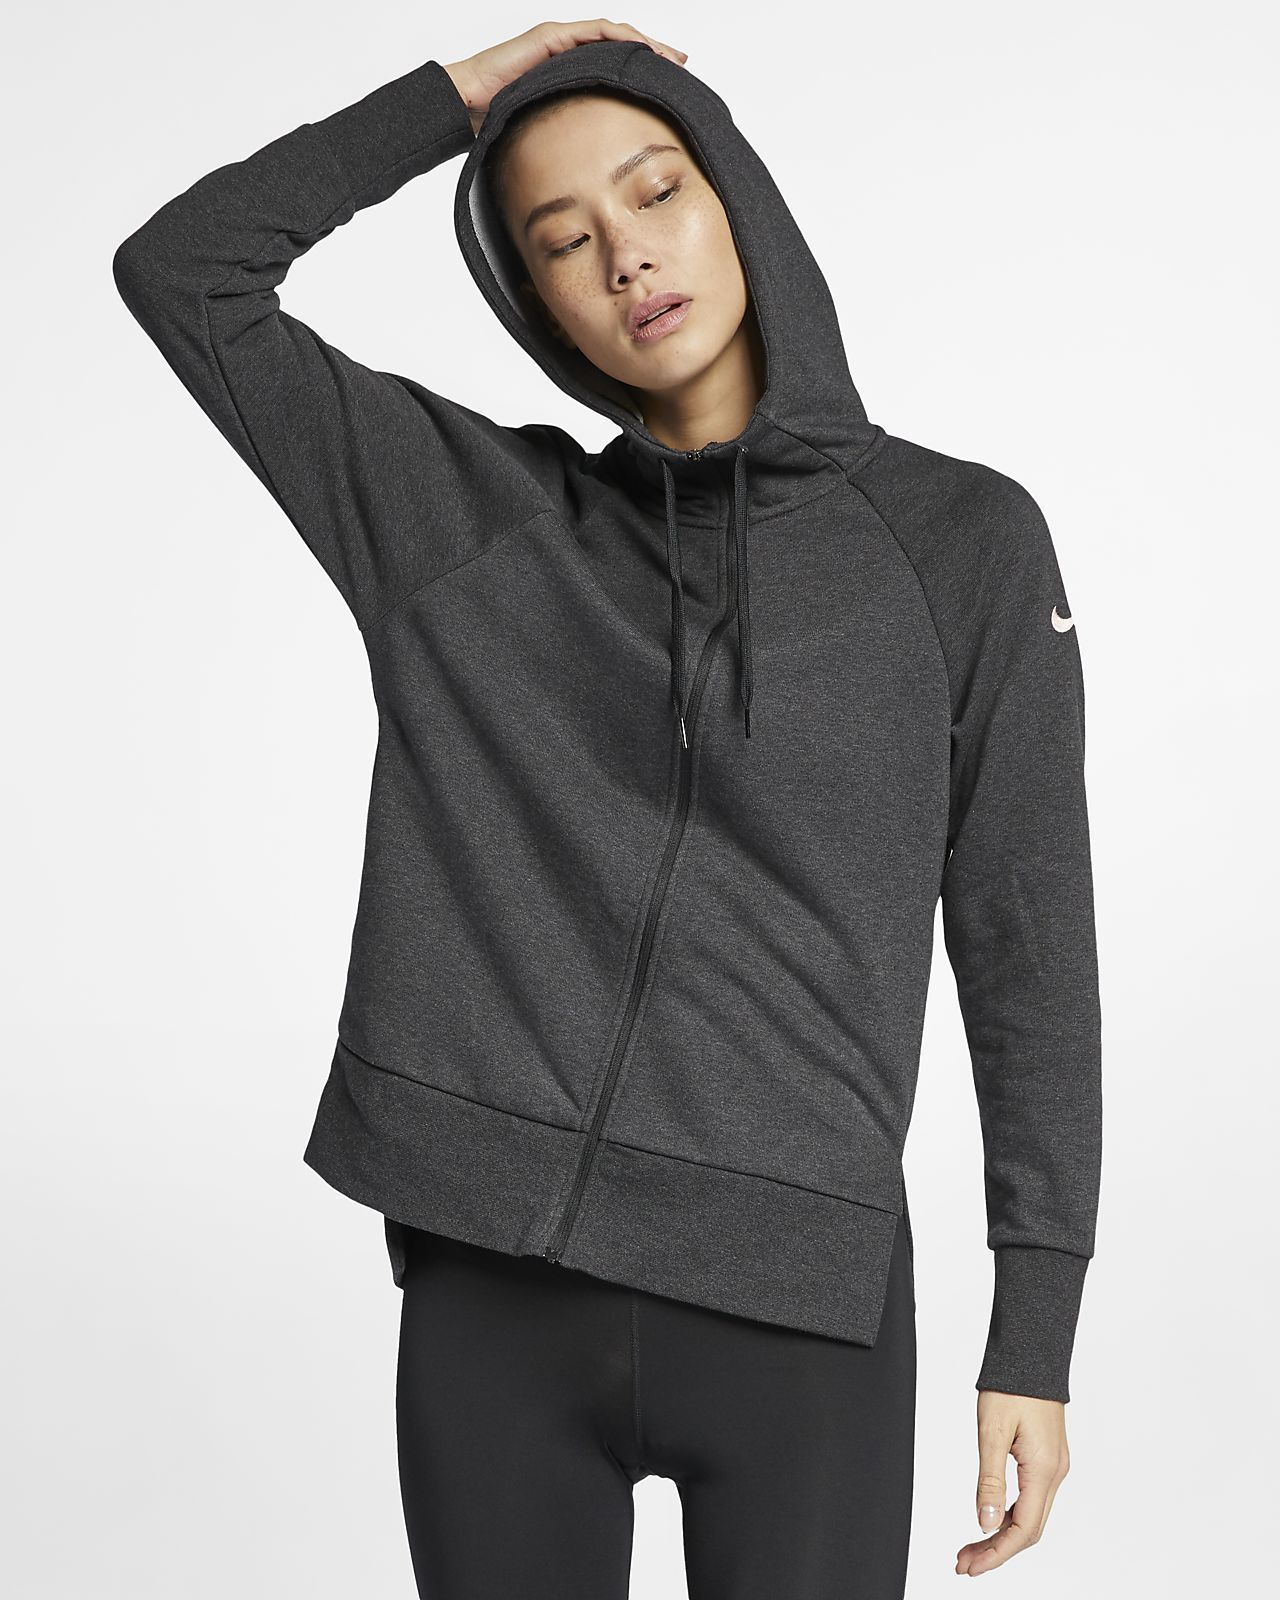 Nike drifit womens fullzip training hoodie fit women